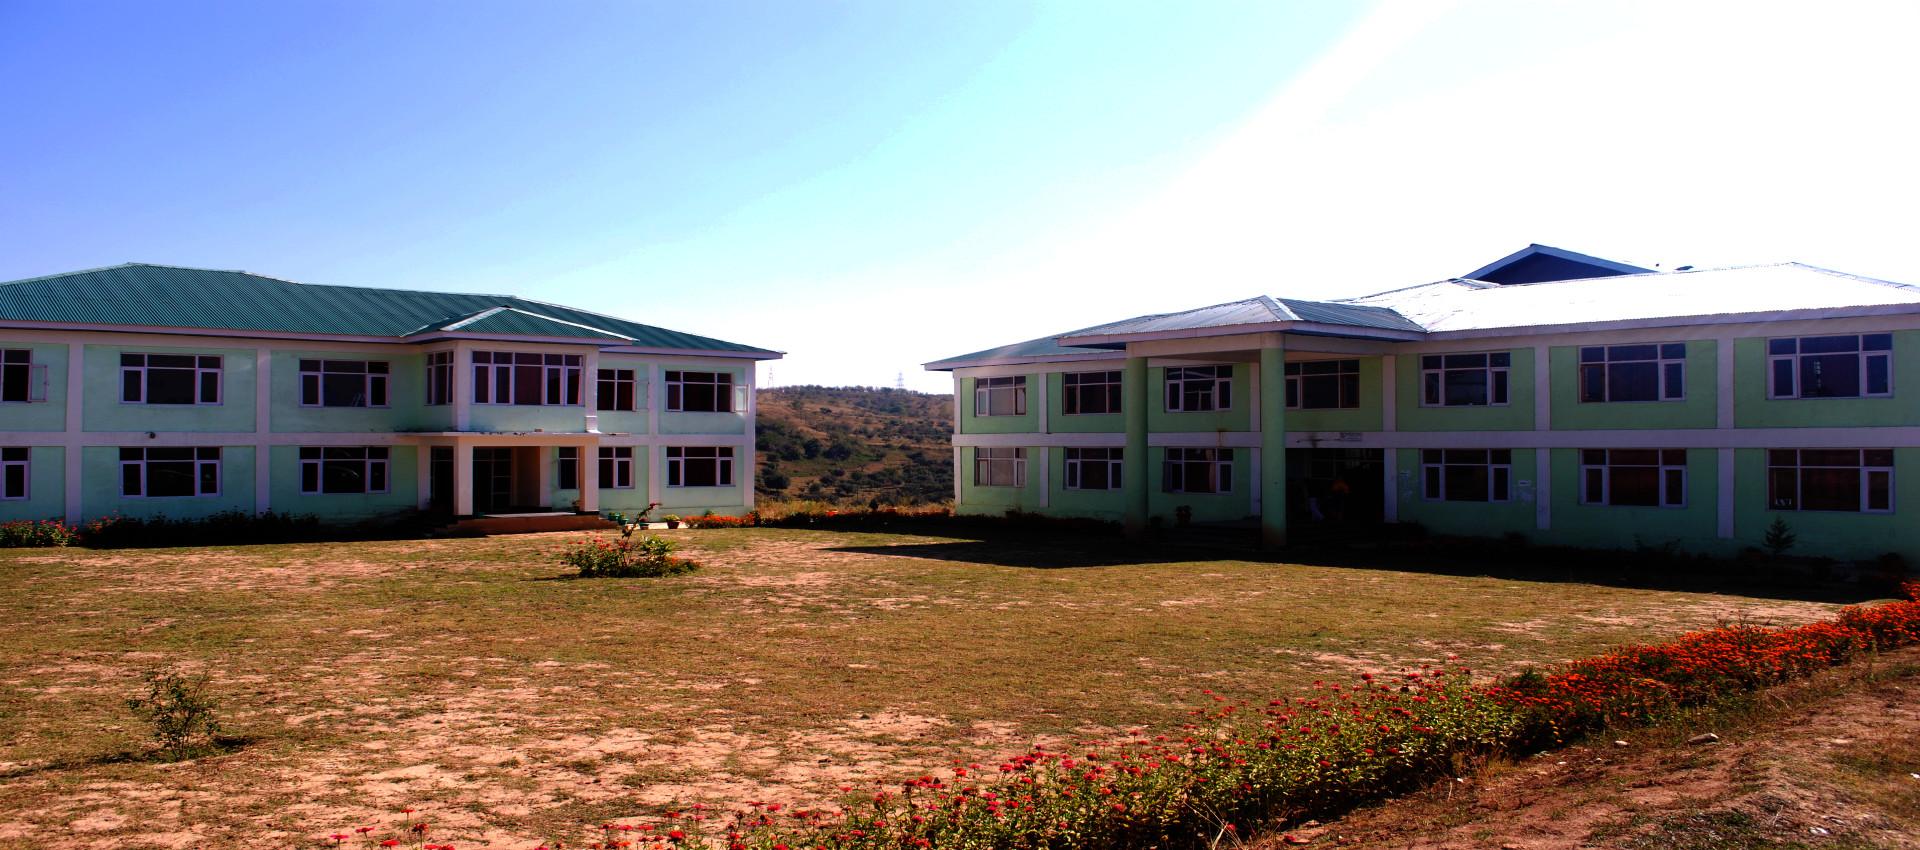 University of Kashmir, North Campus